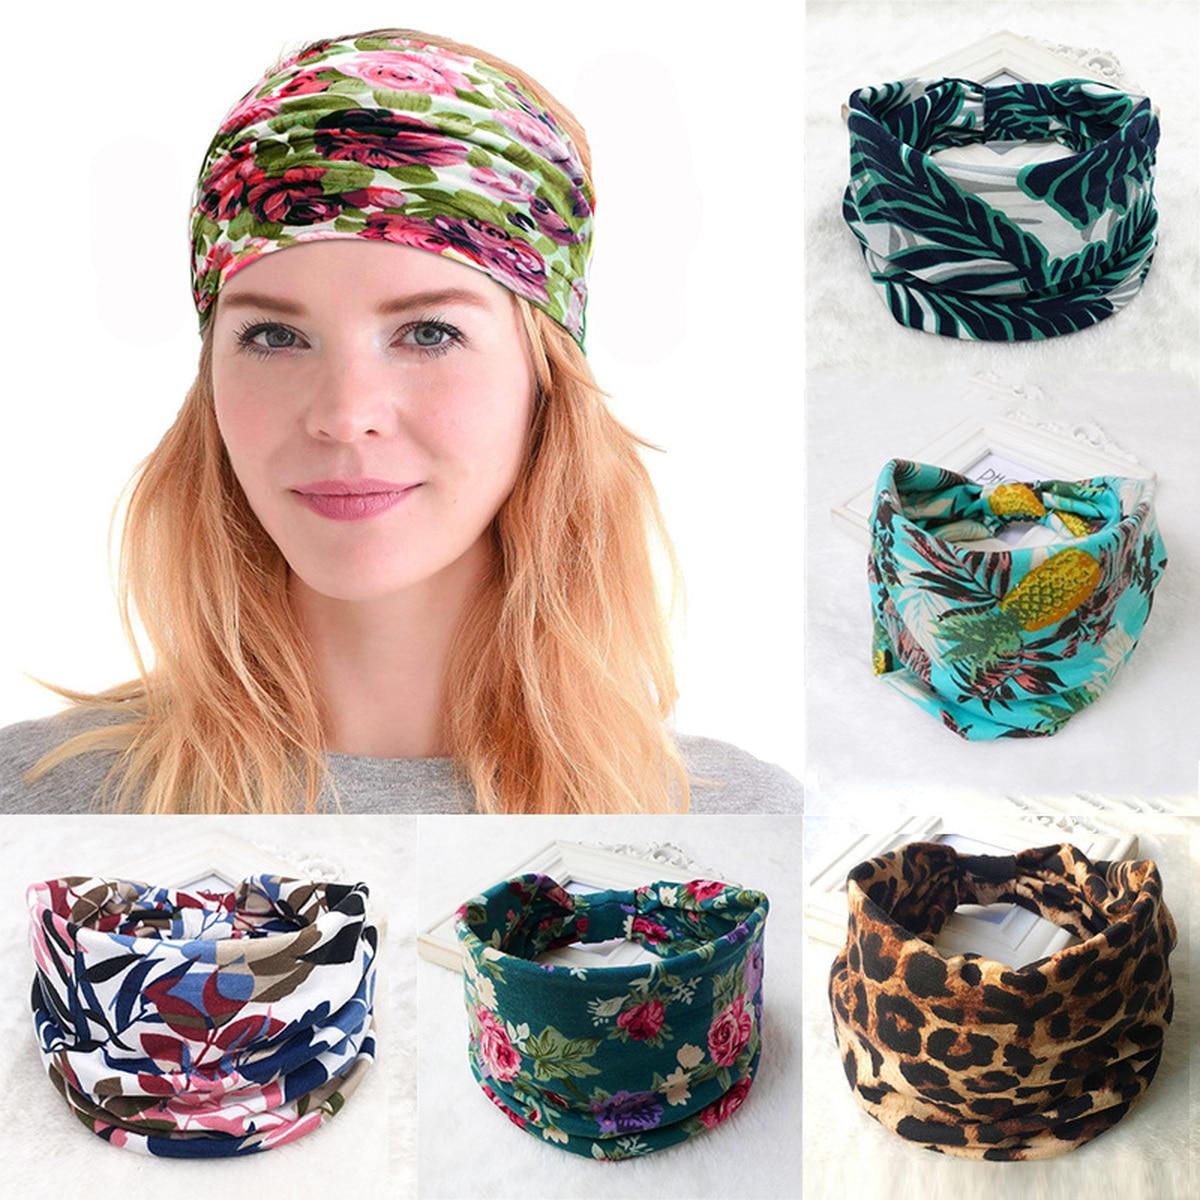 Fashion Korean BOHO Wide Cotton Stretch Women Headbands Bohemia Bandage Hair Bands Headpiece Headwrap Turban   Headwear   Bandana